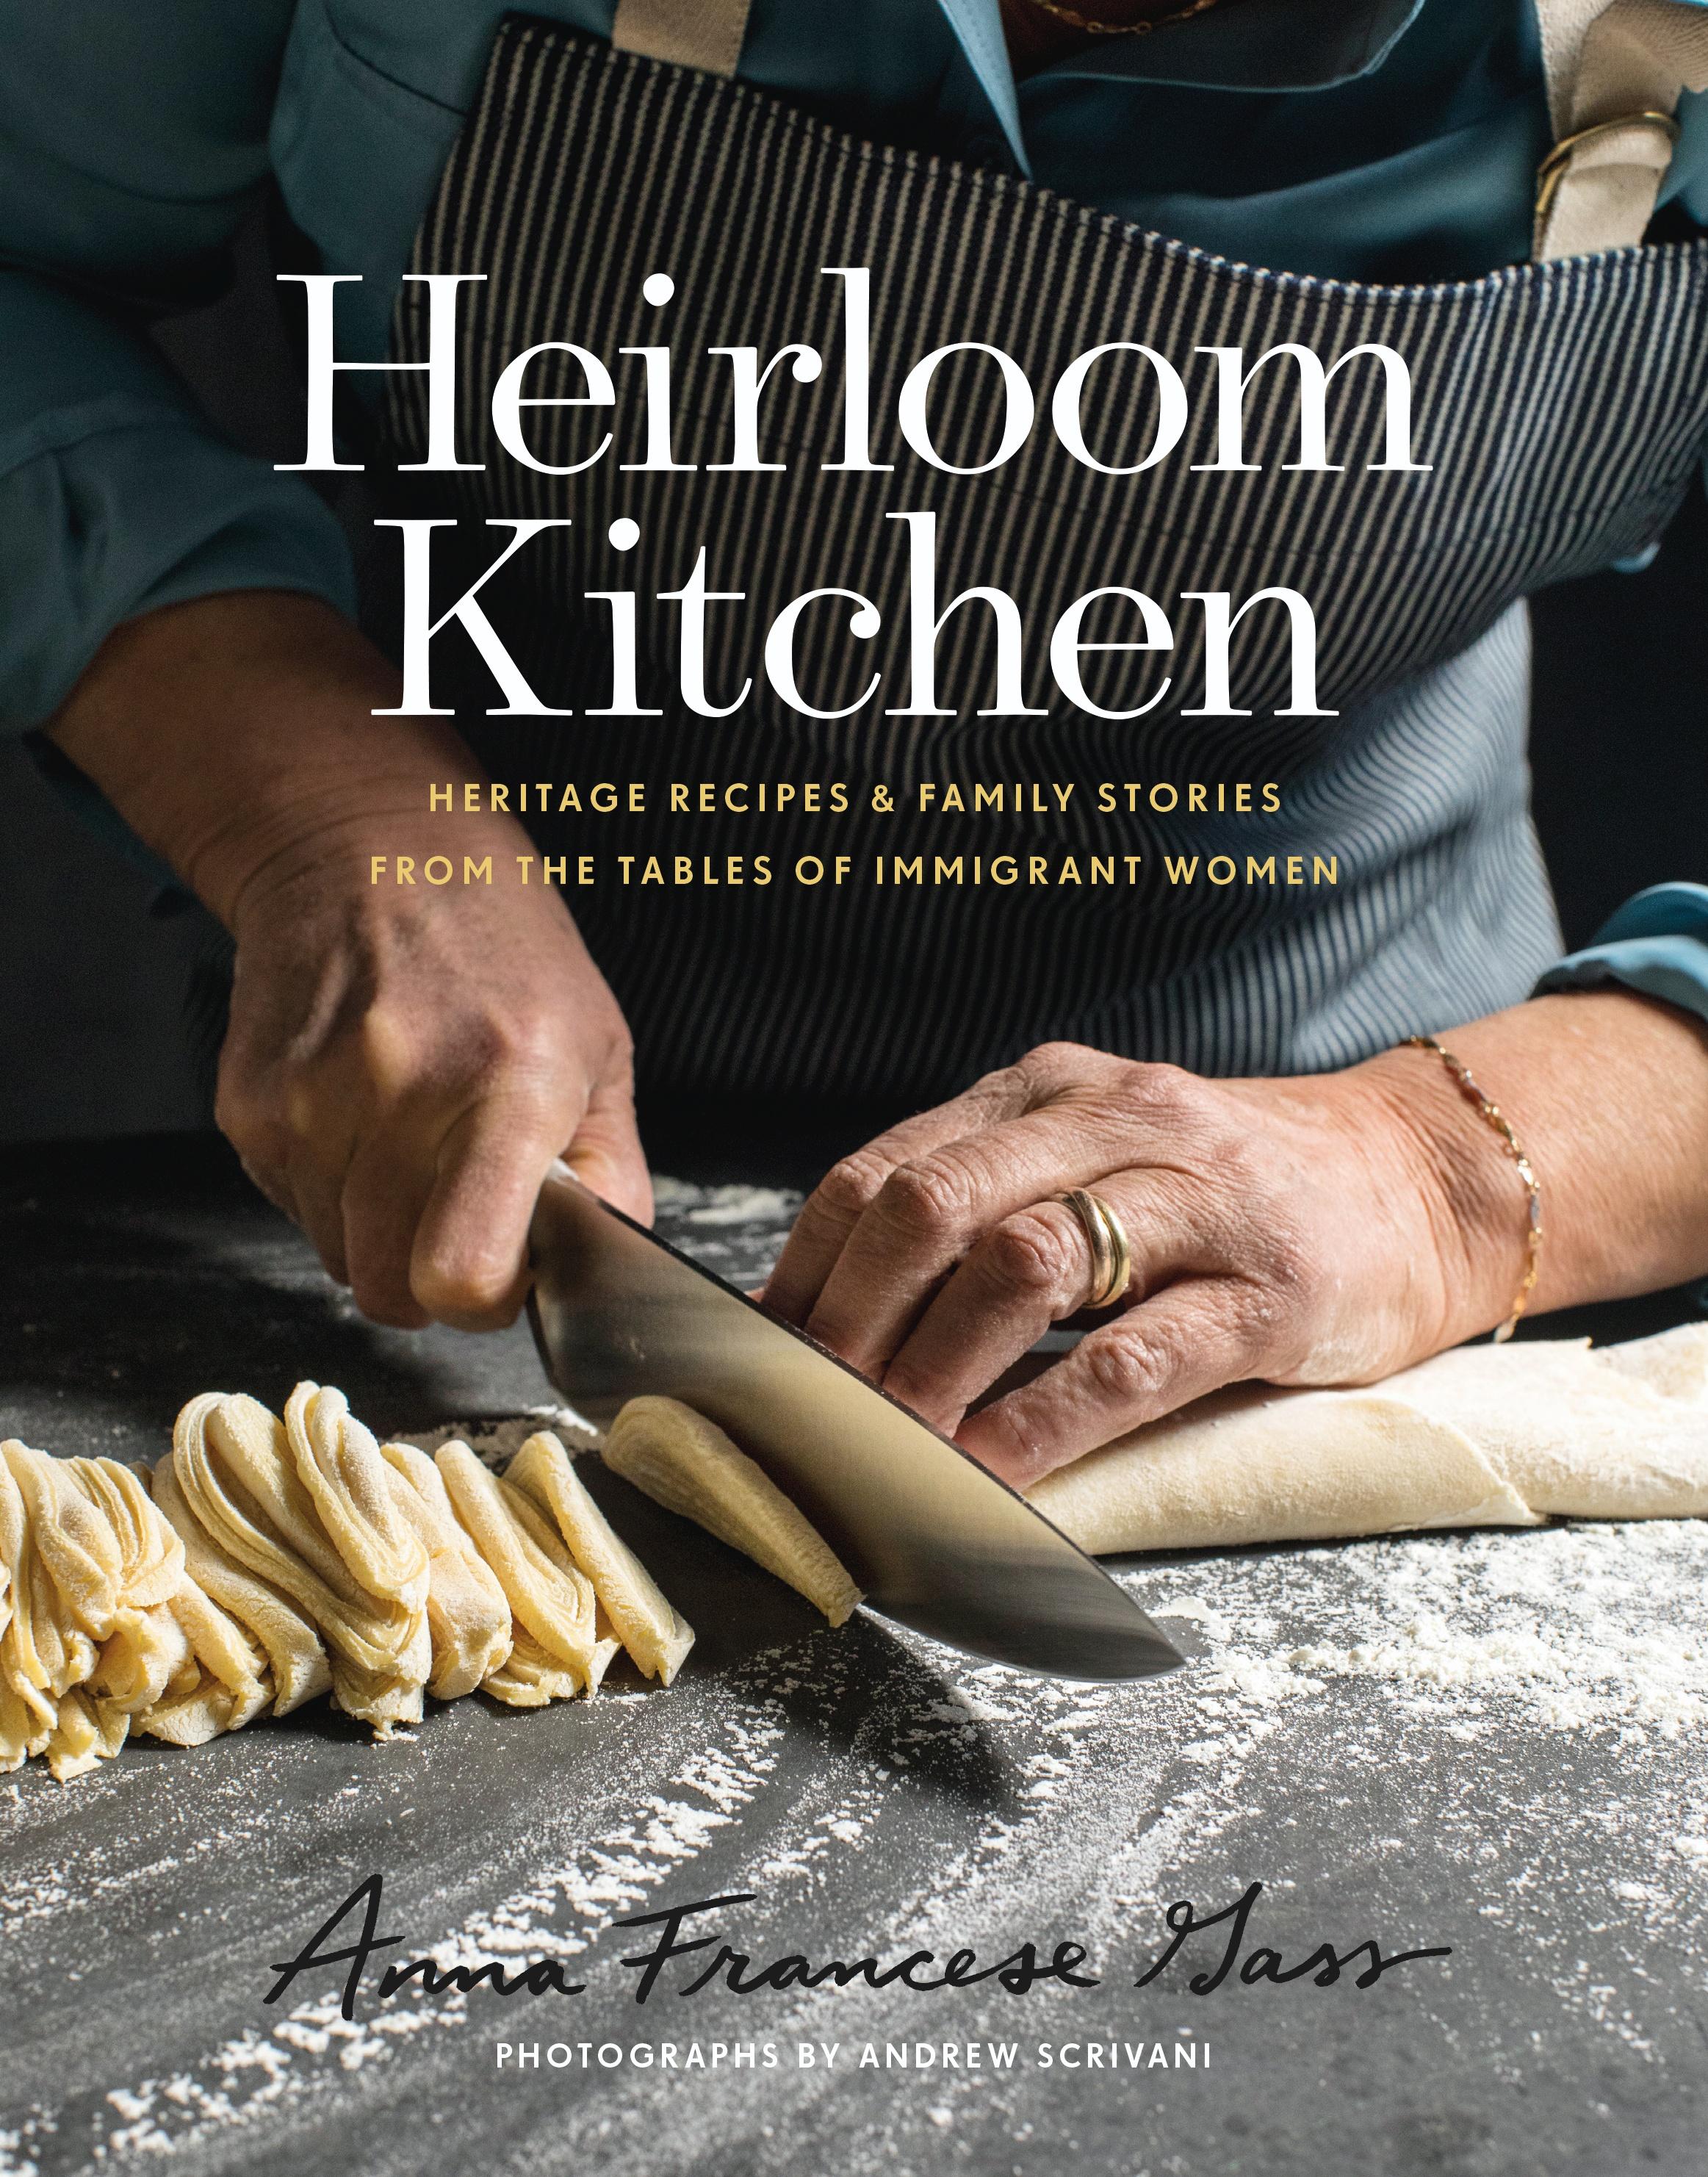 Heirloom Kitchen Final Cover.JPG.jpeg